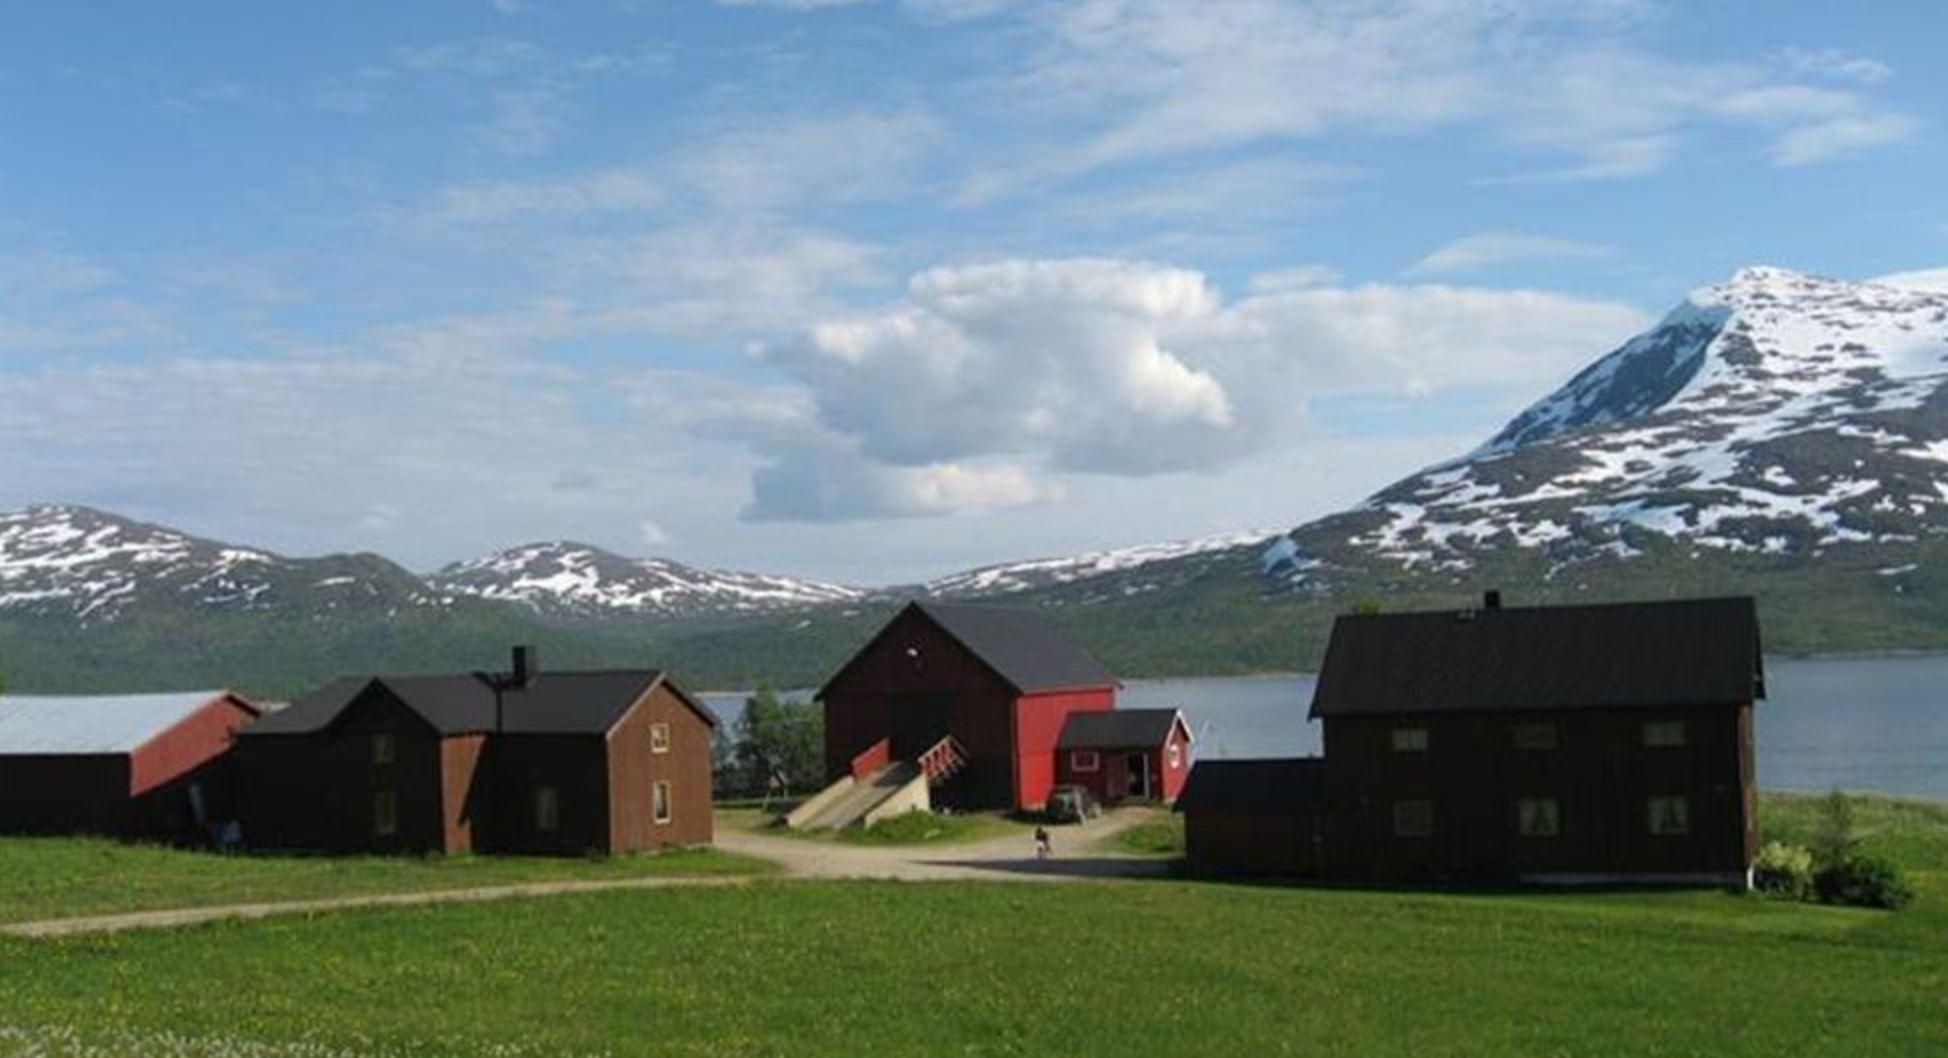 Stekvasselv Fjellgård - a mountain farm